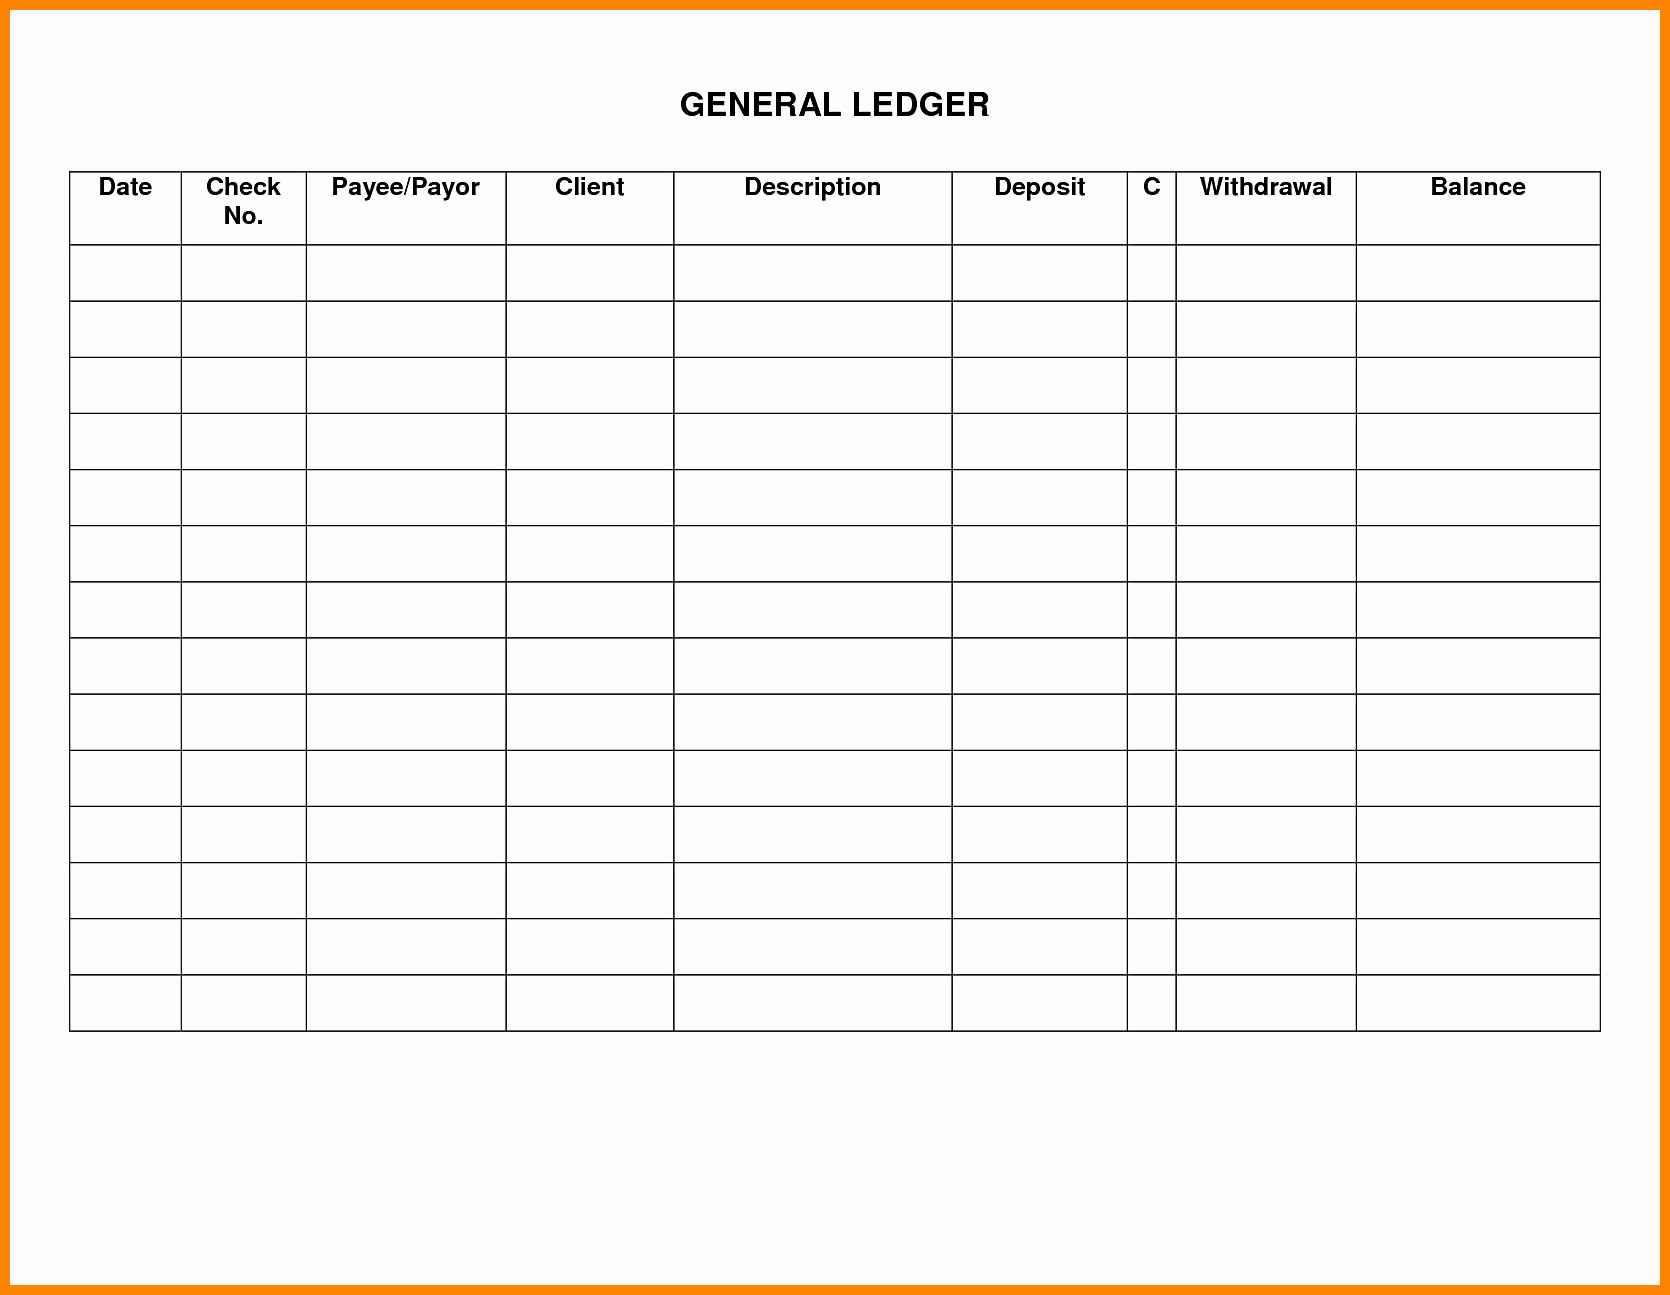 Excel Ledger Template Luxury General Ledger Template Excel